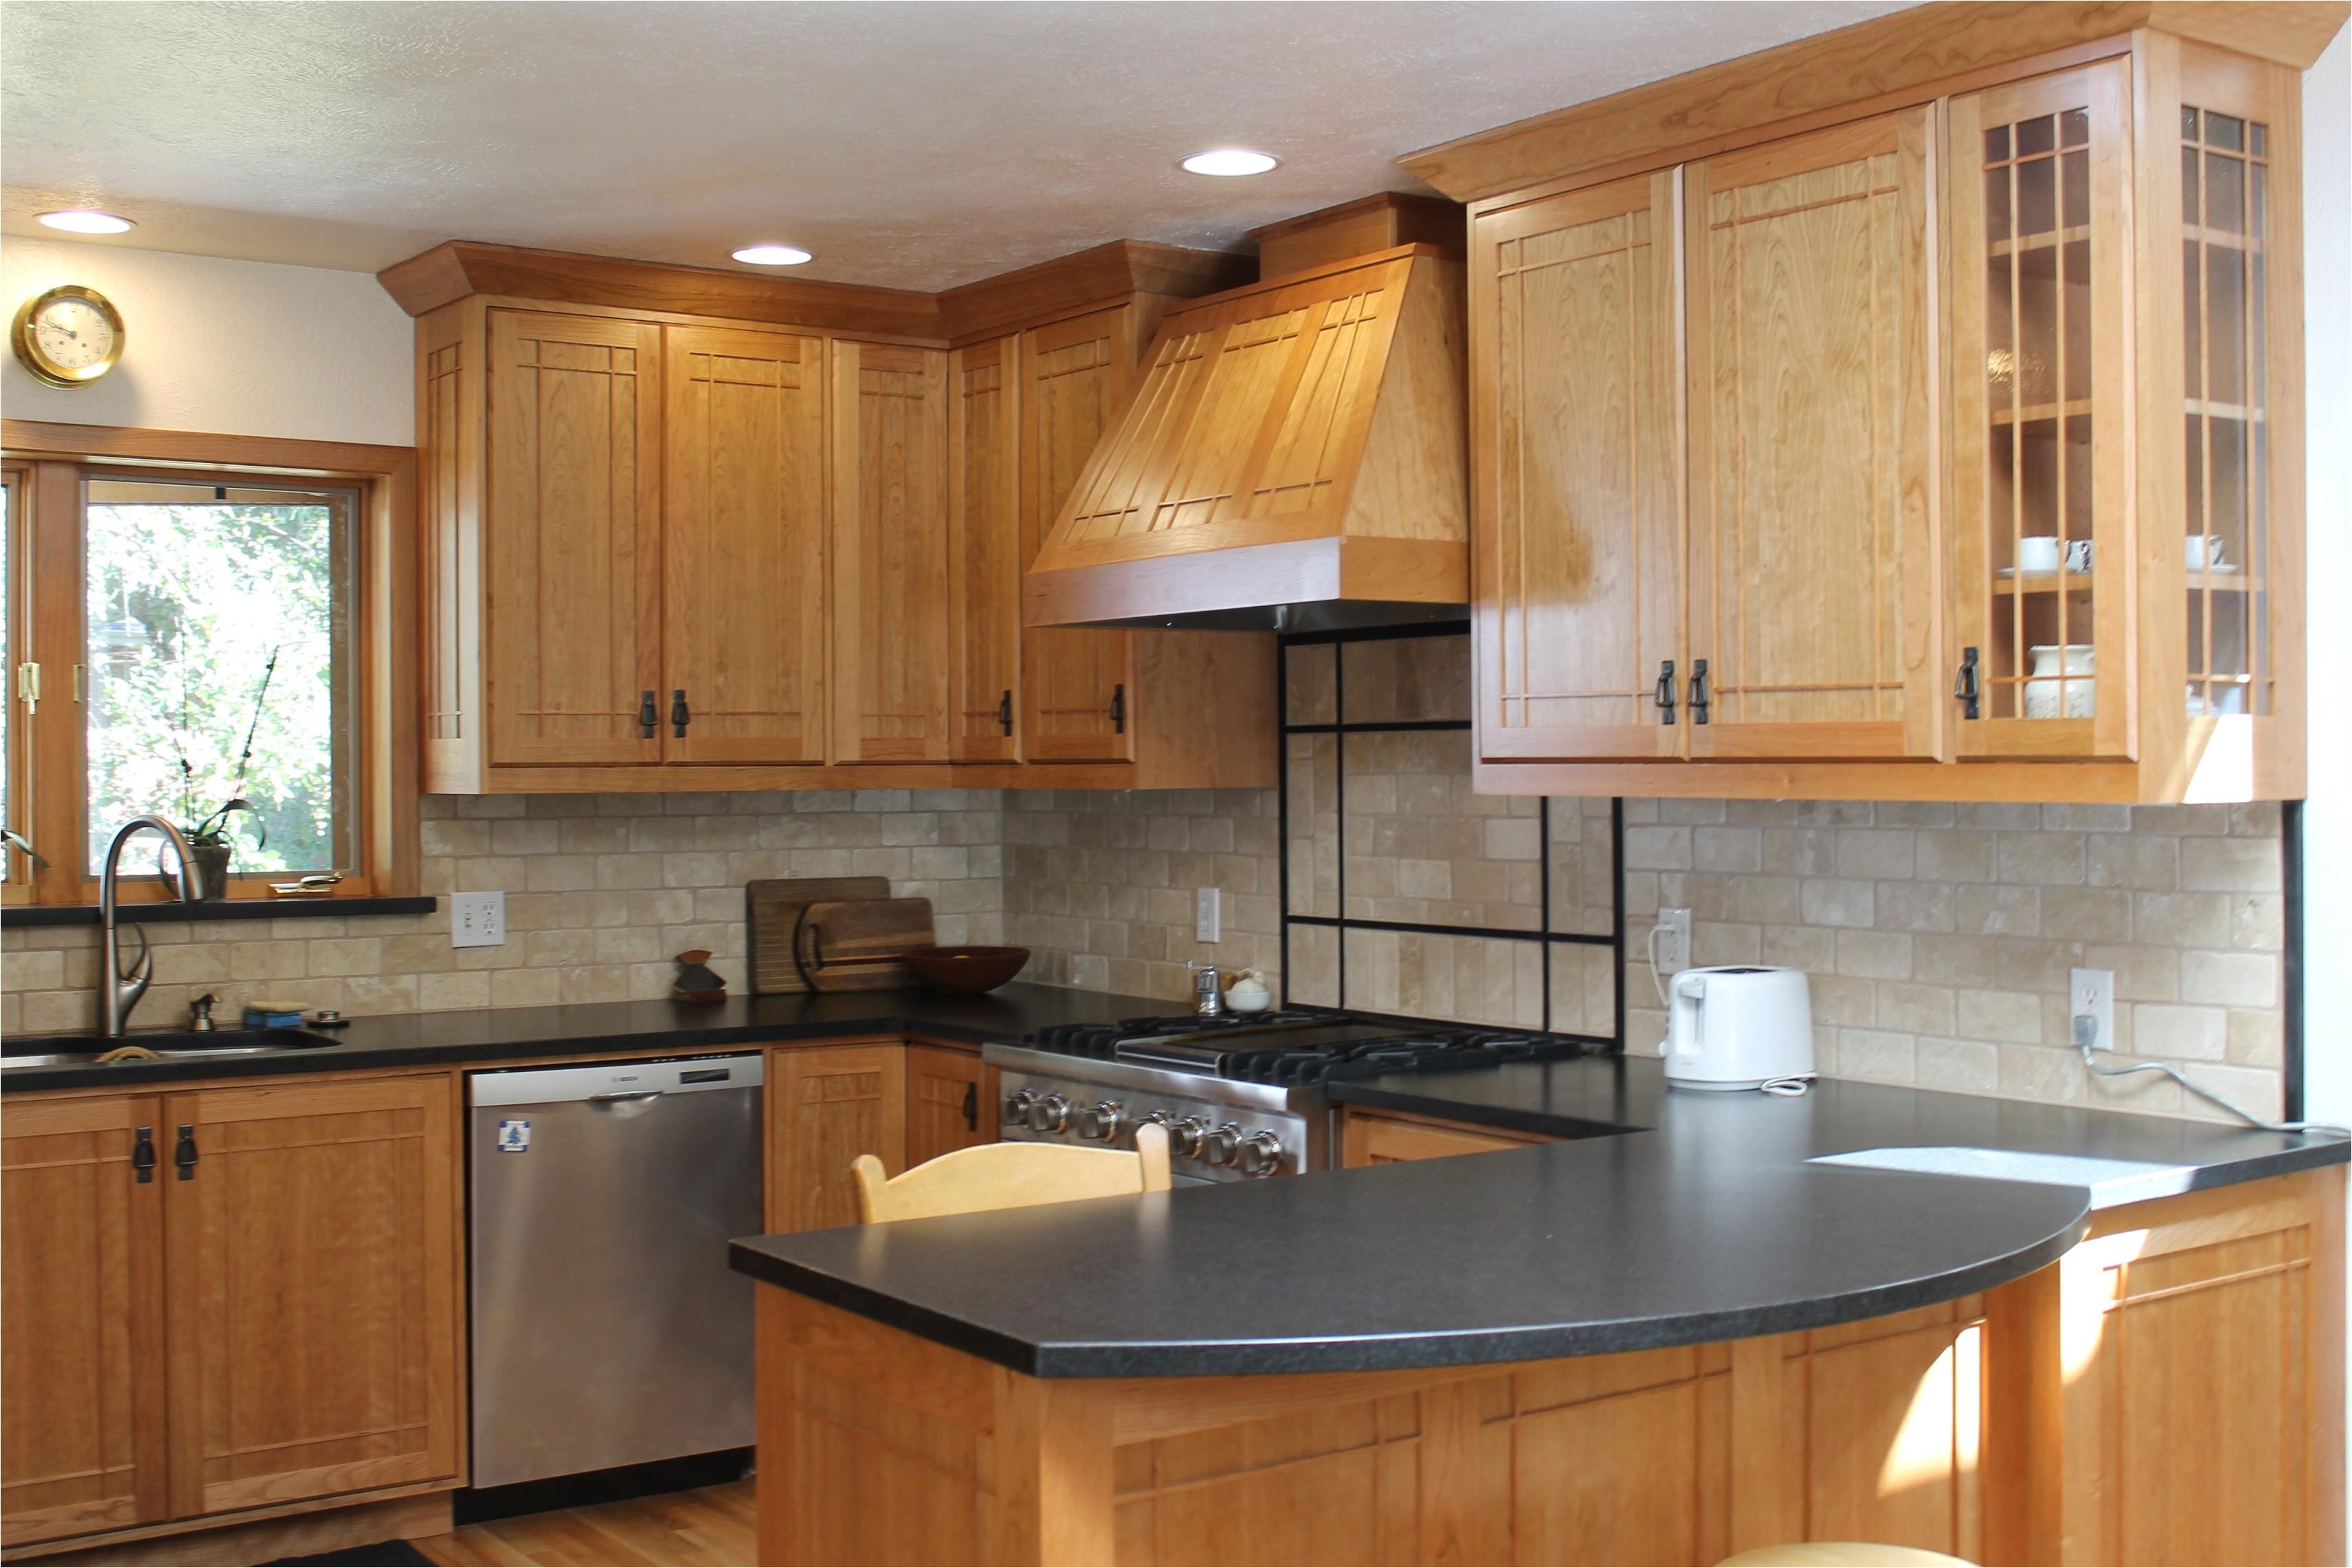 aristokraft cabinet price list best of aristokraft cabinets excellent aristokraft kitchen cabinets parr